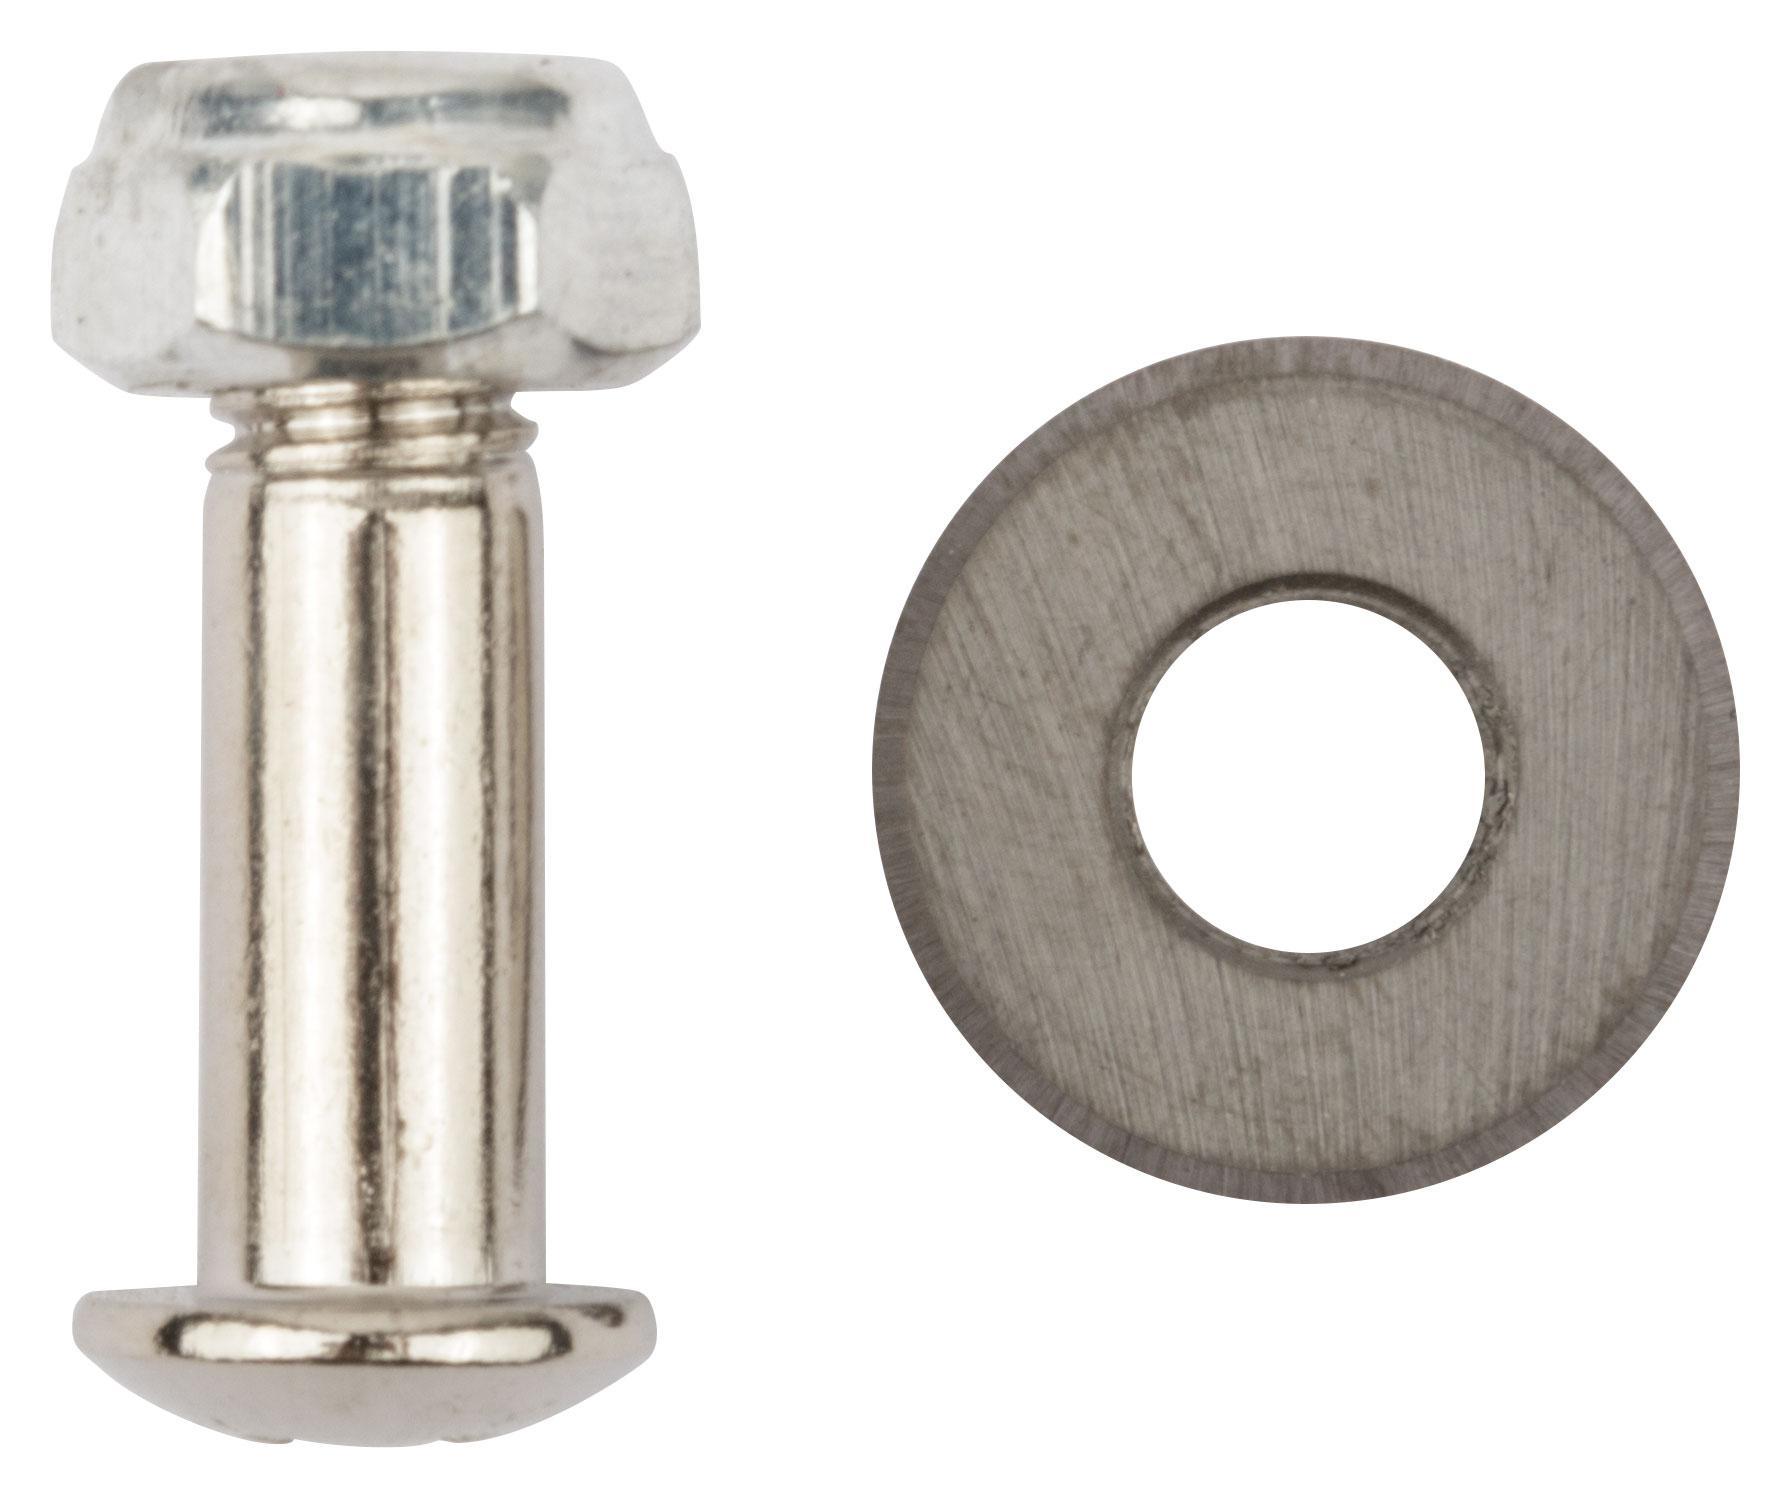 Ролик (диск) для плиткореза, 16мм Fit 16841